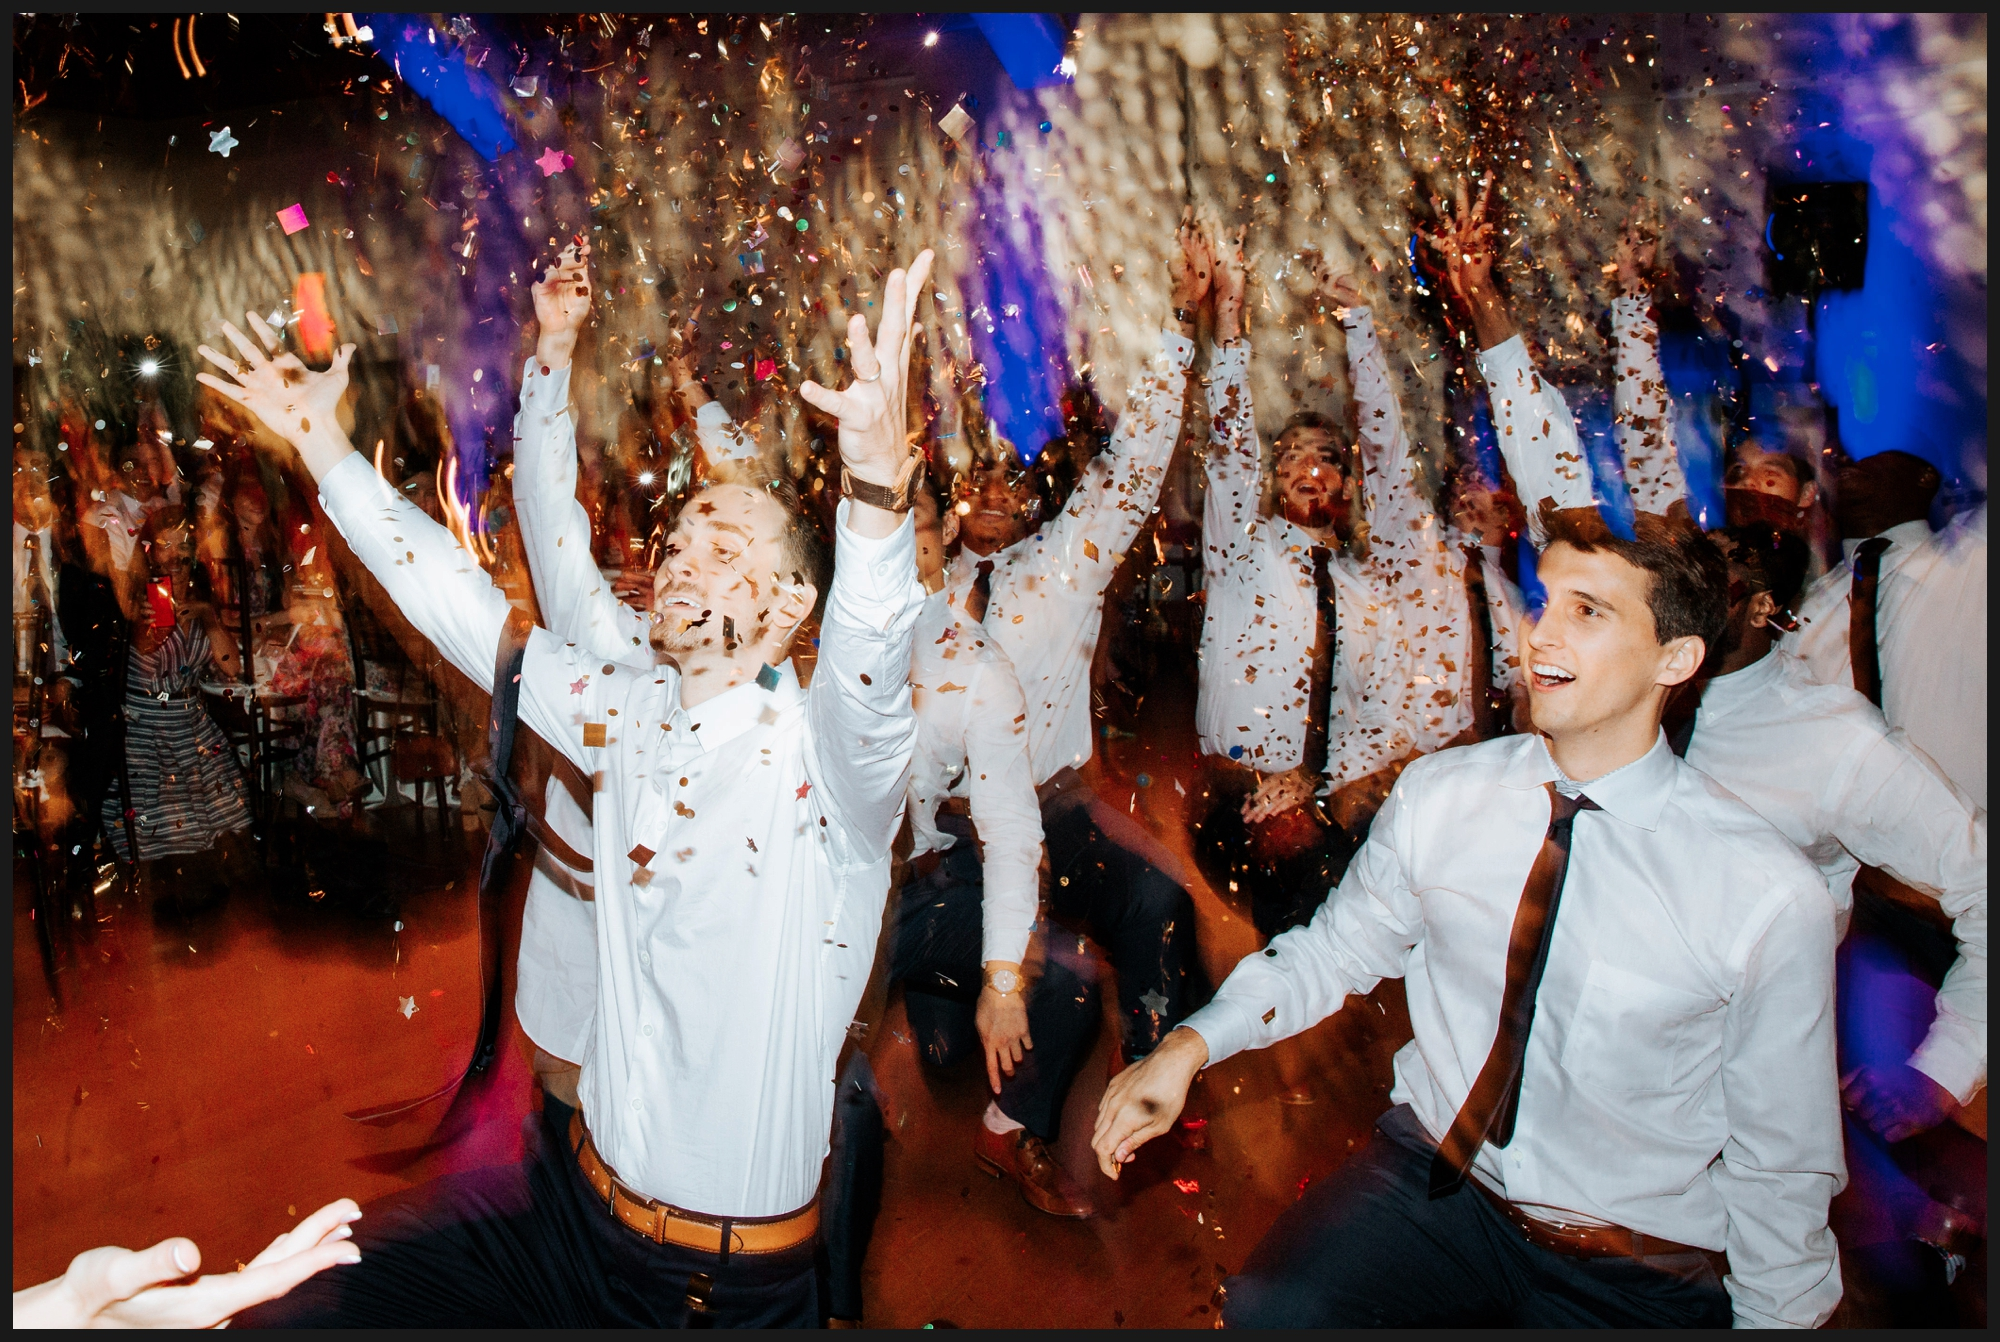 Orlando-Wedding-Photographer-destination-wedding-photographer-florida-wedding-photographer-bohemian-wedding-photographer_0124.jpg